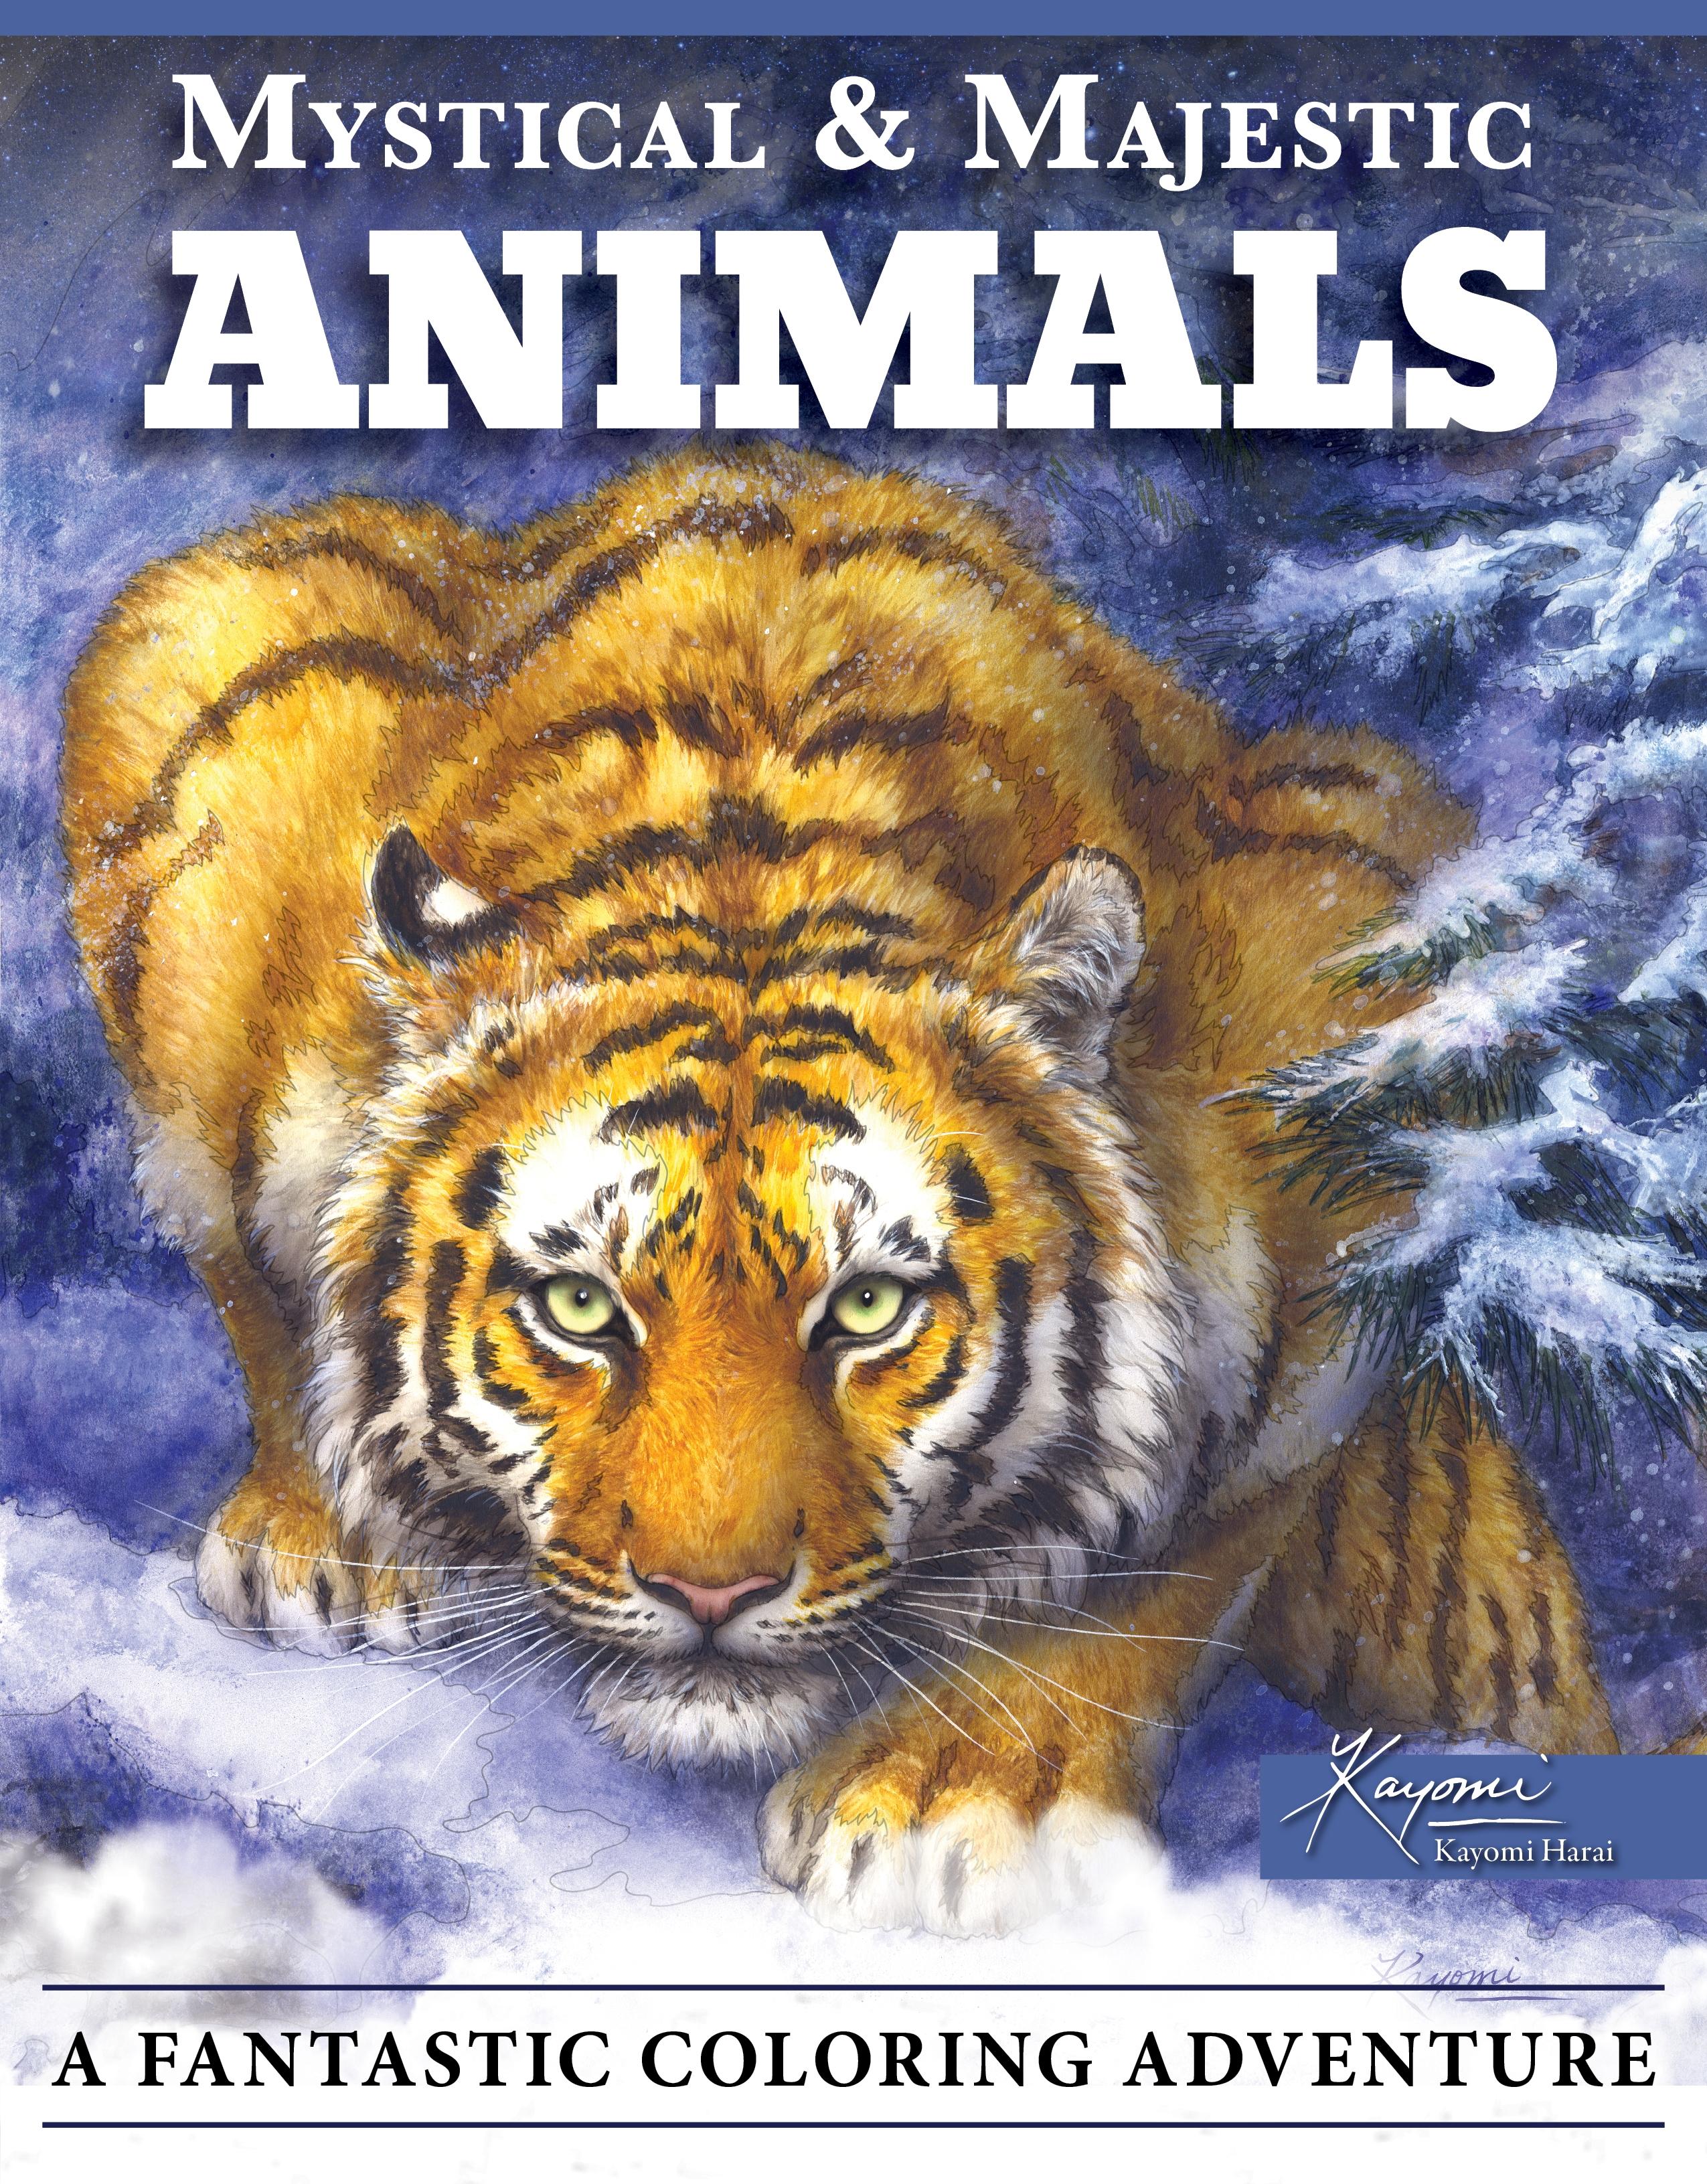 Mystical & Majestic Animals